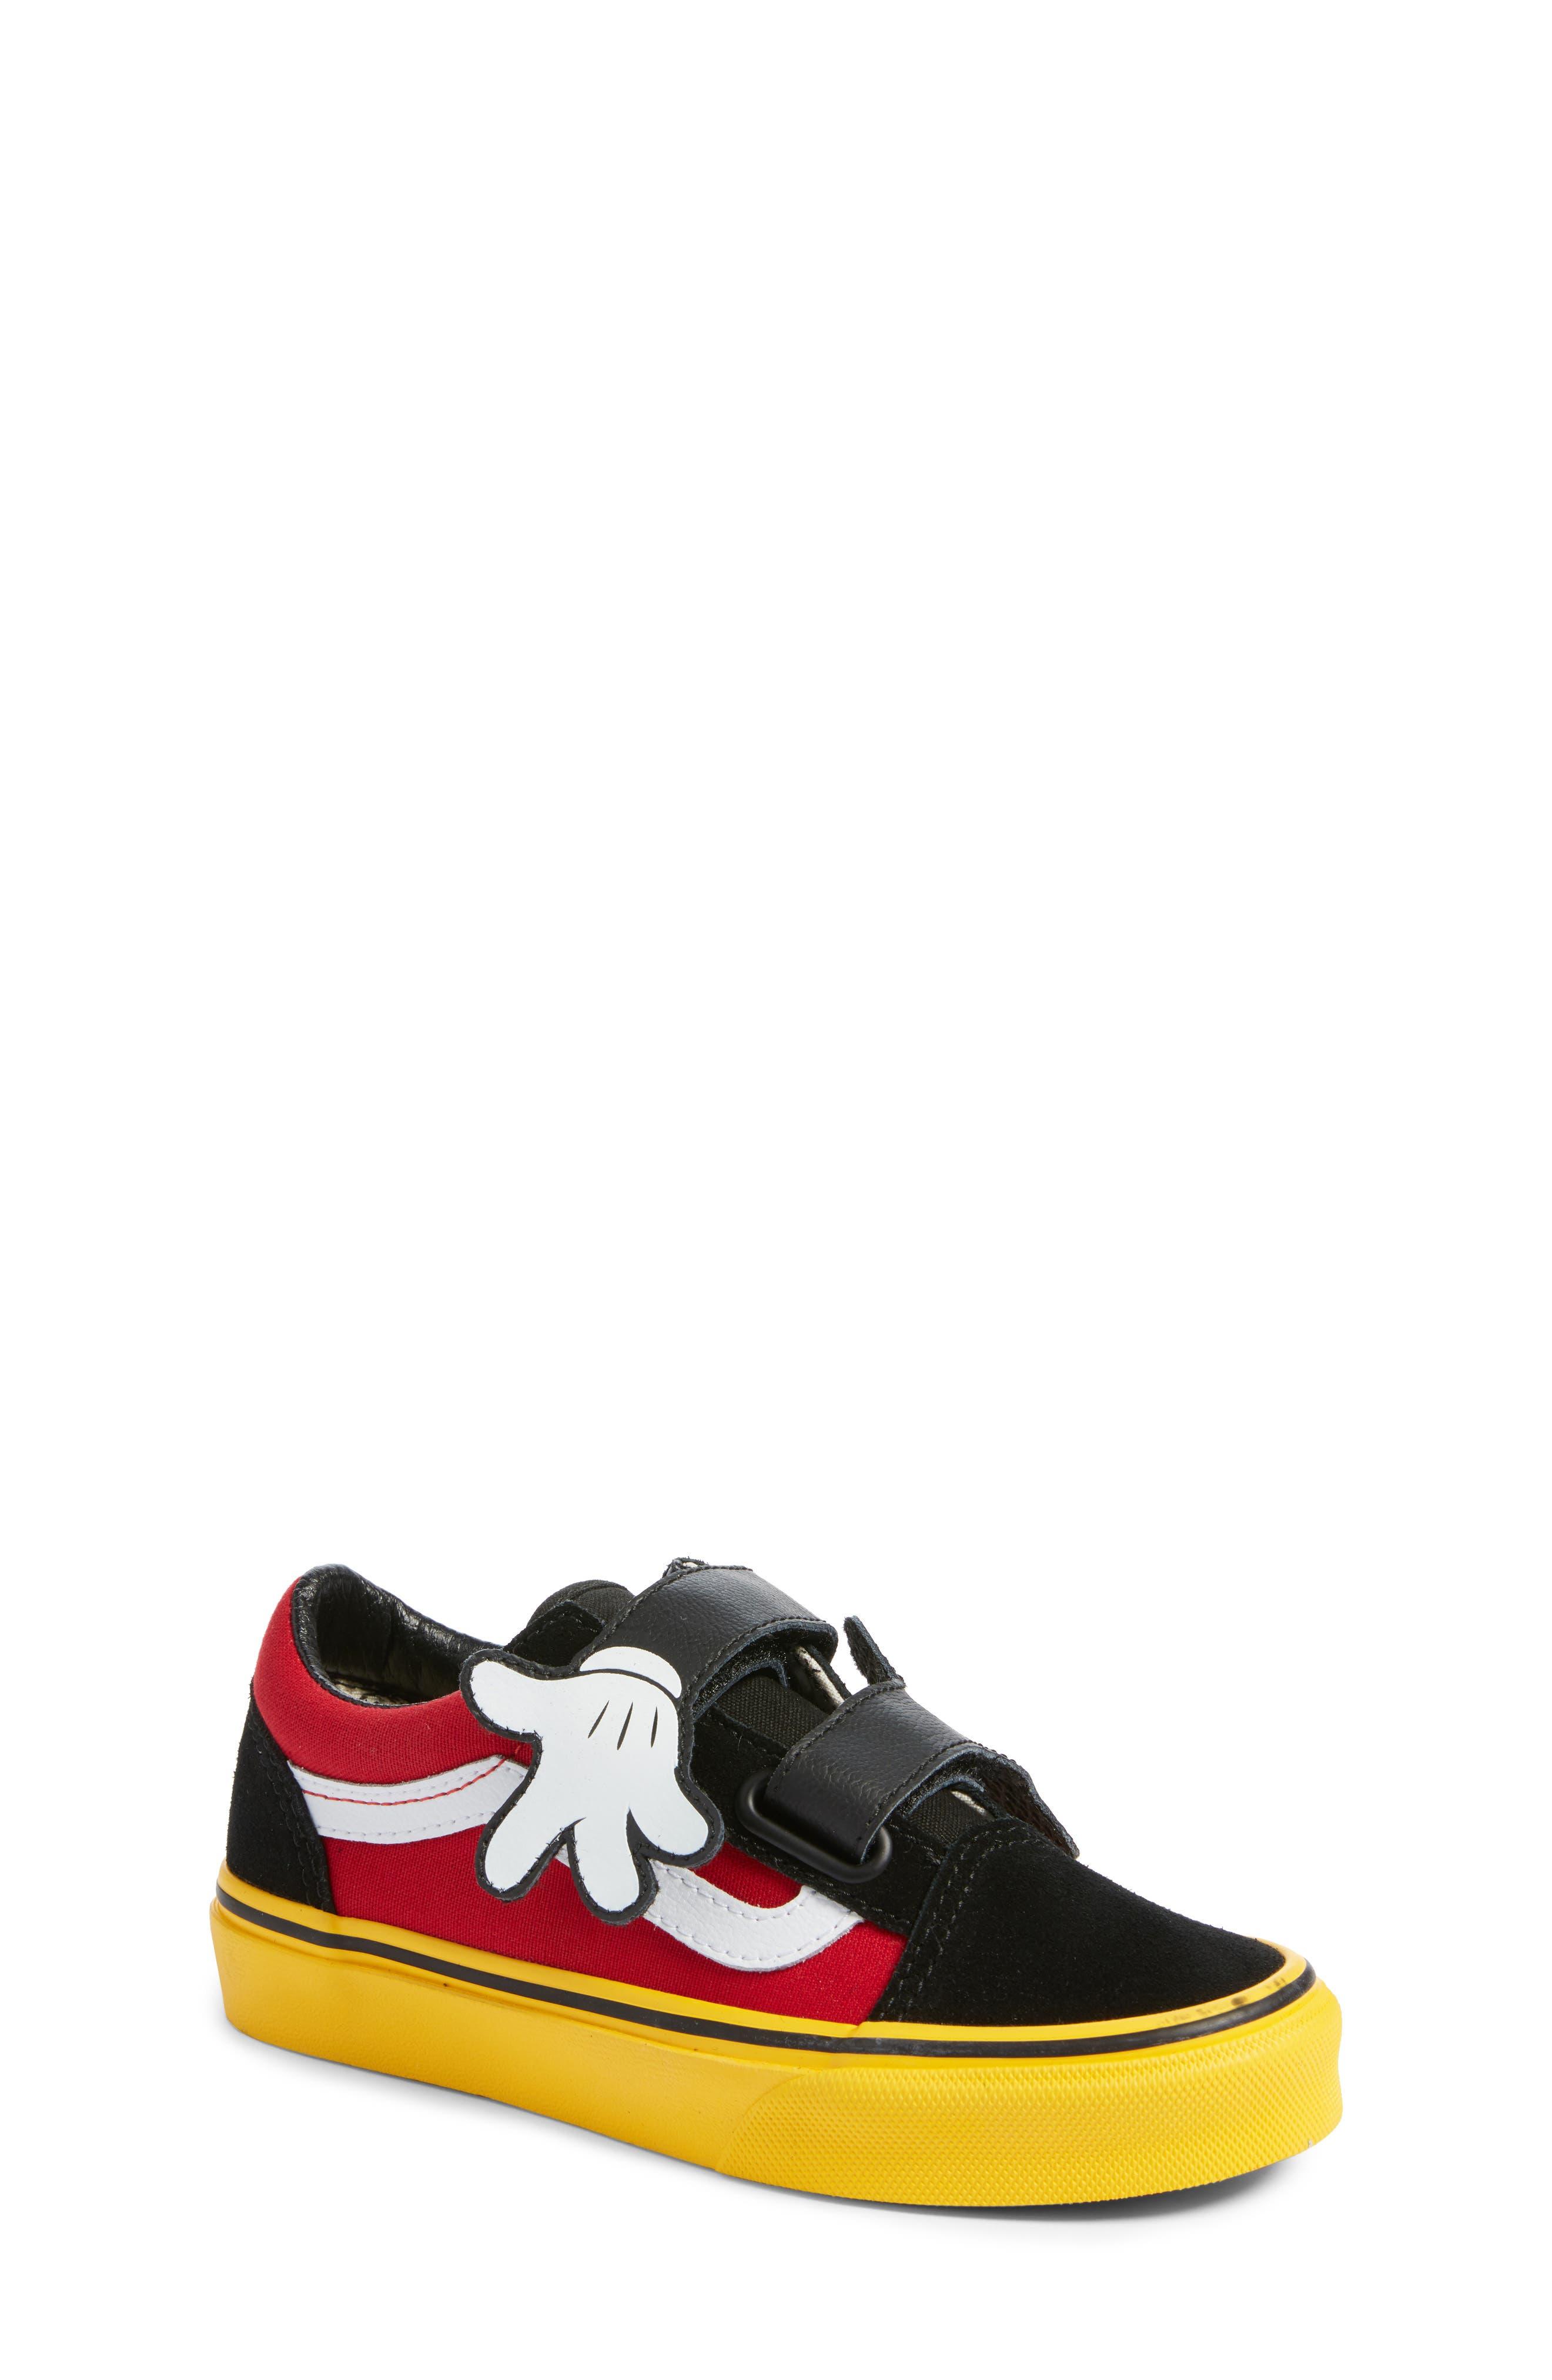 childrens vans shoes